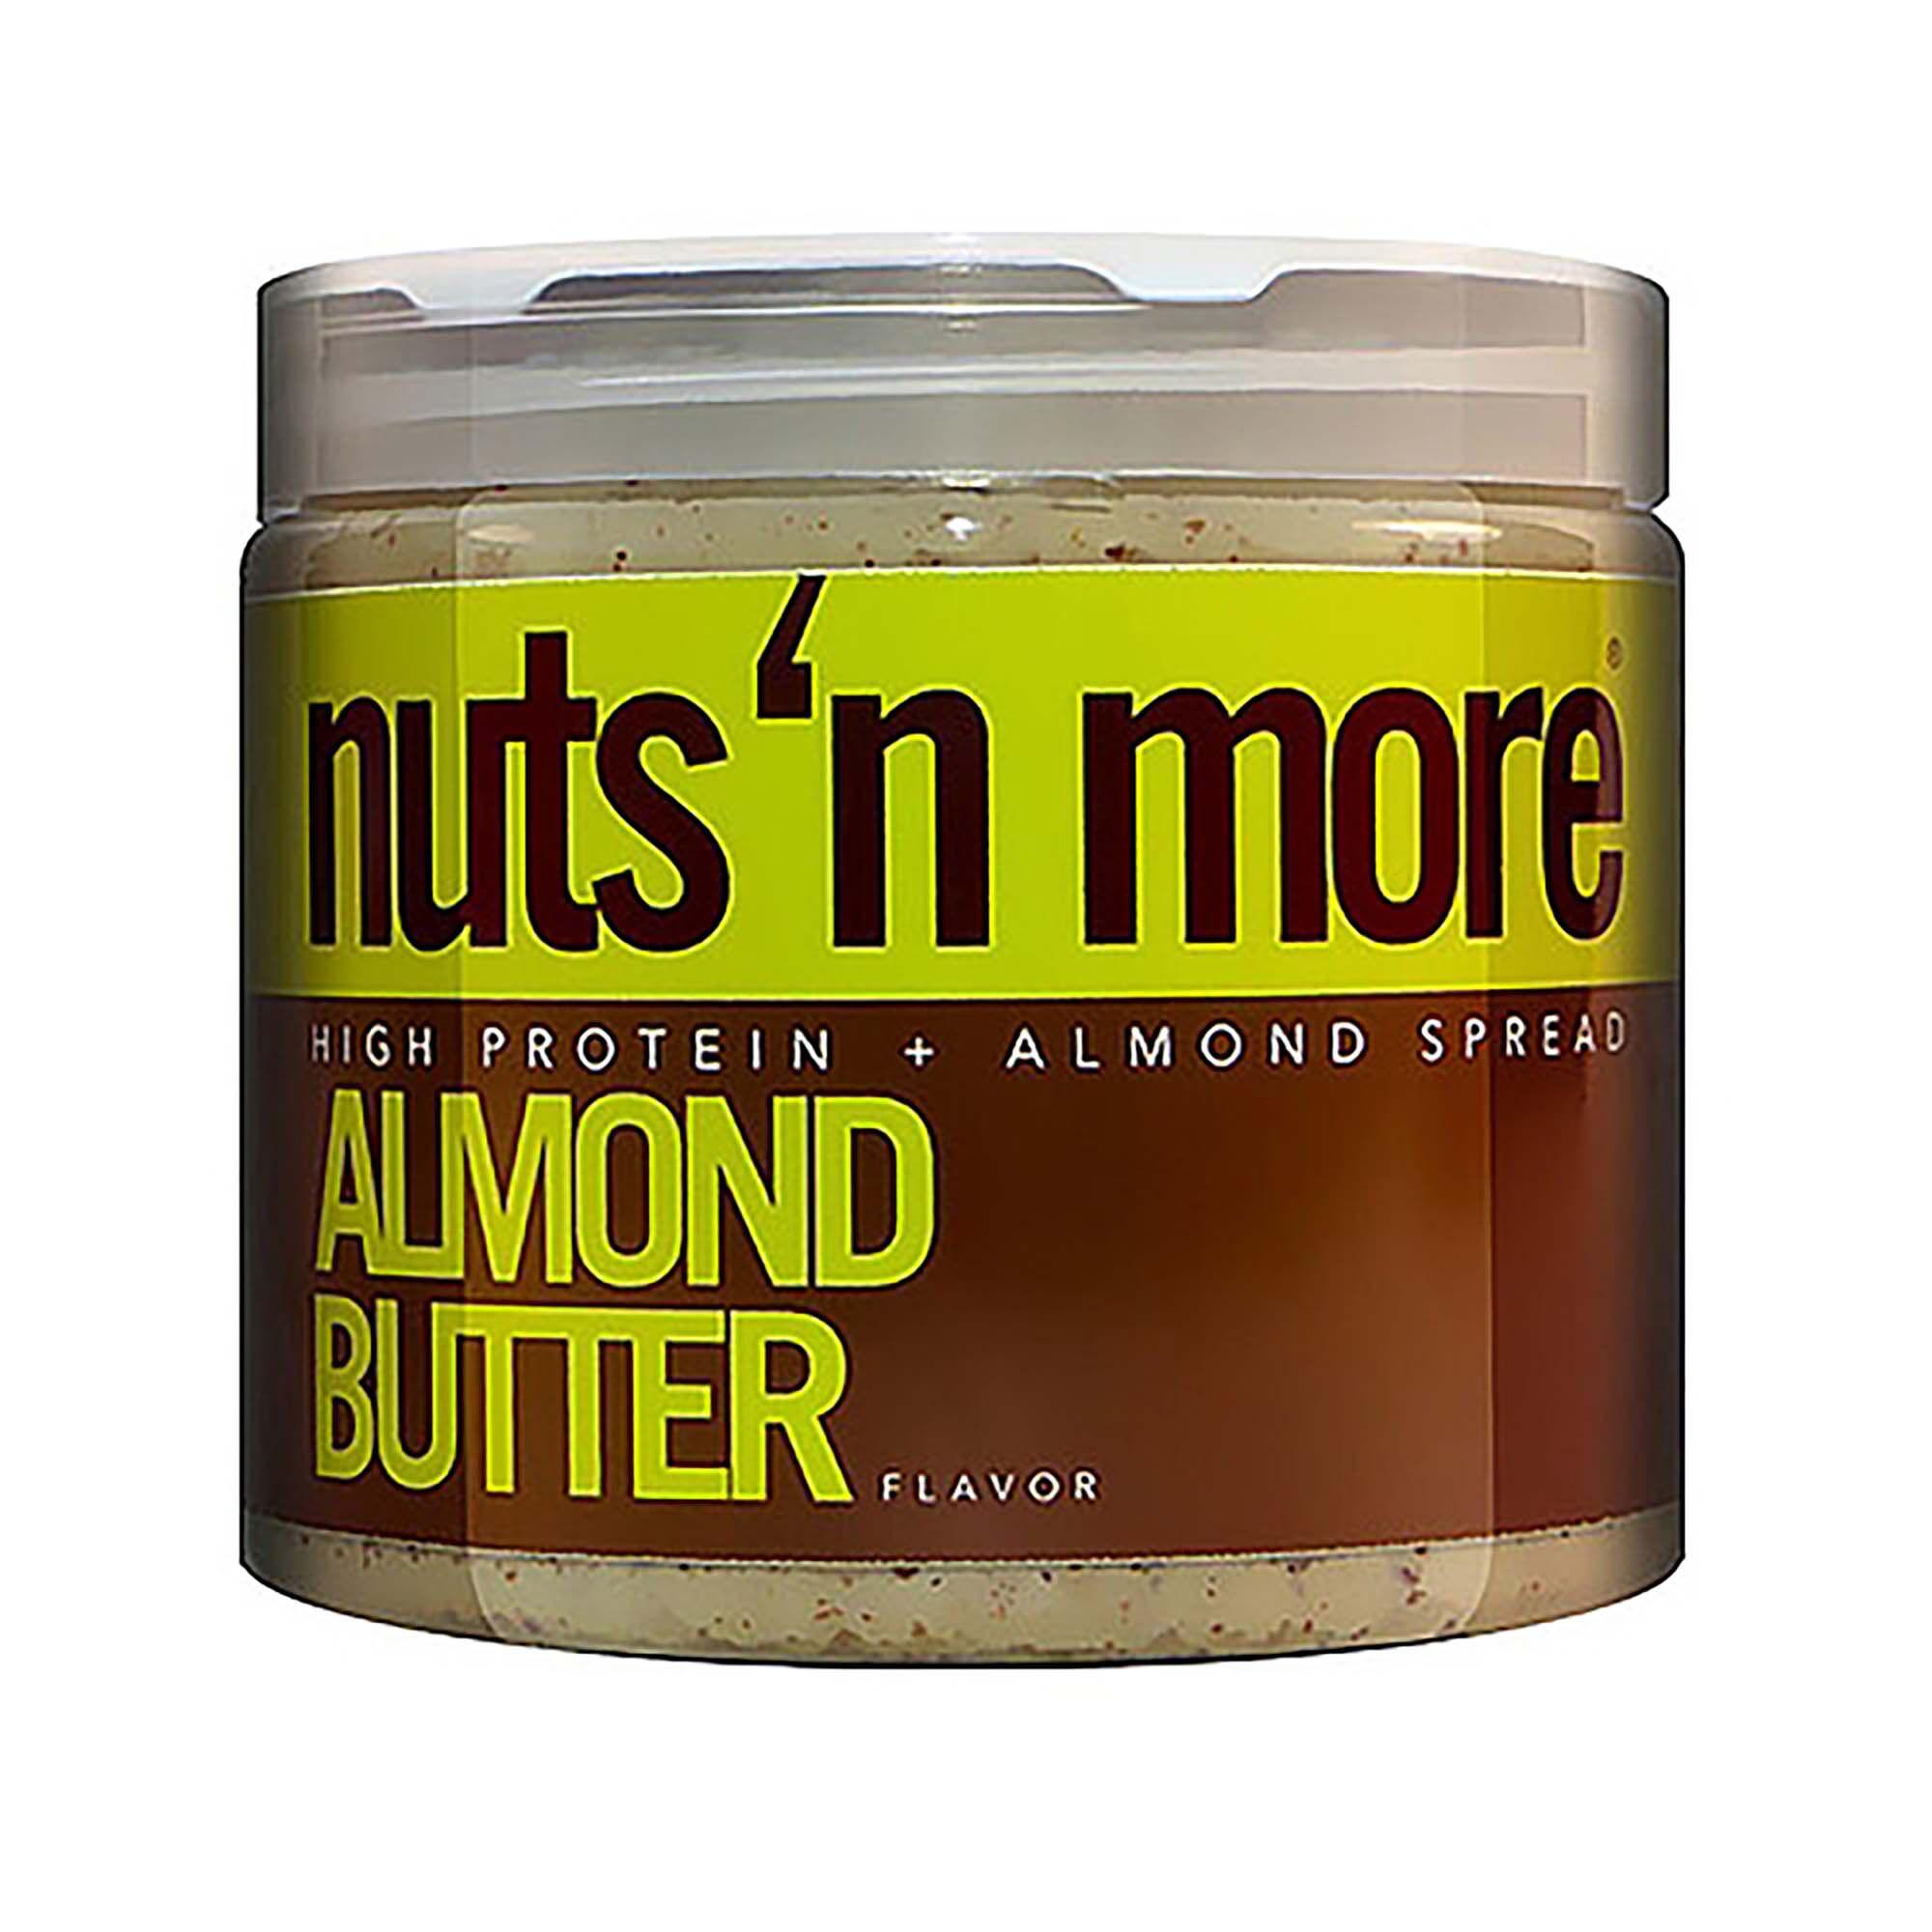 nuts 'n more® Almond Butter Original | GNC